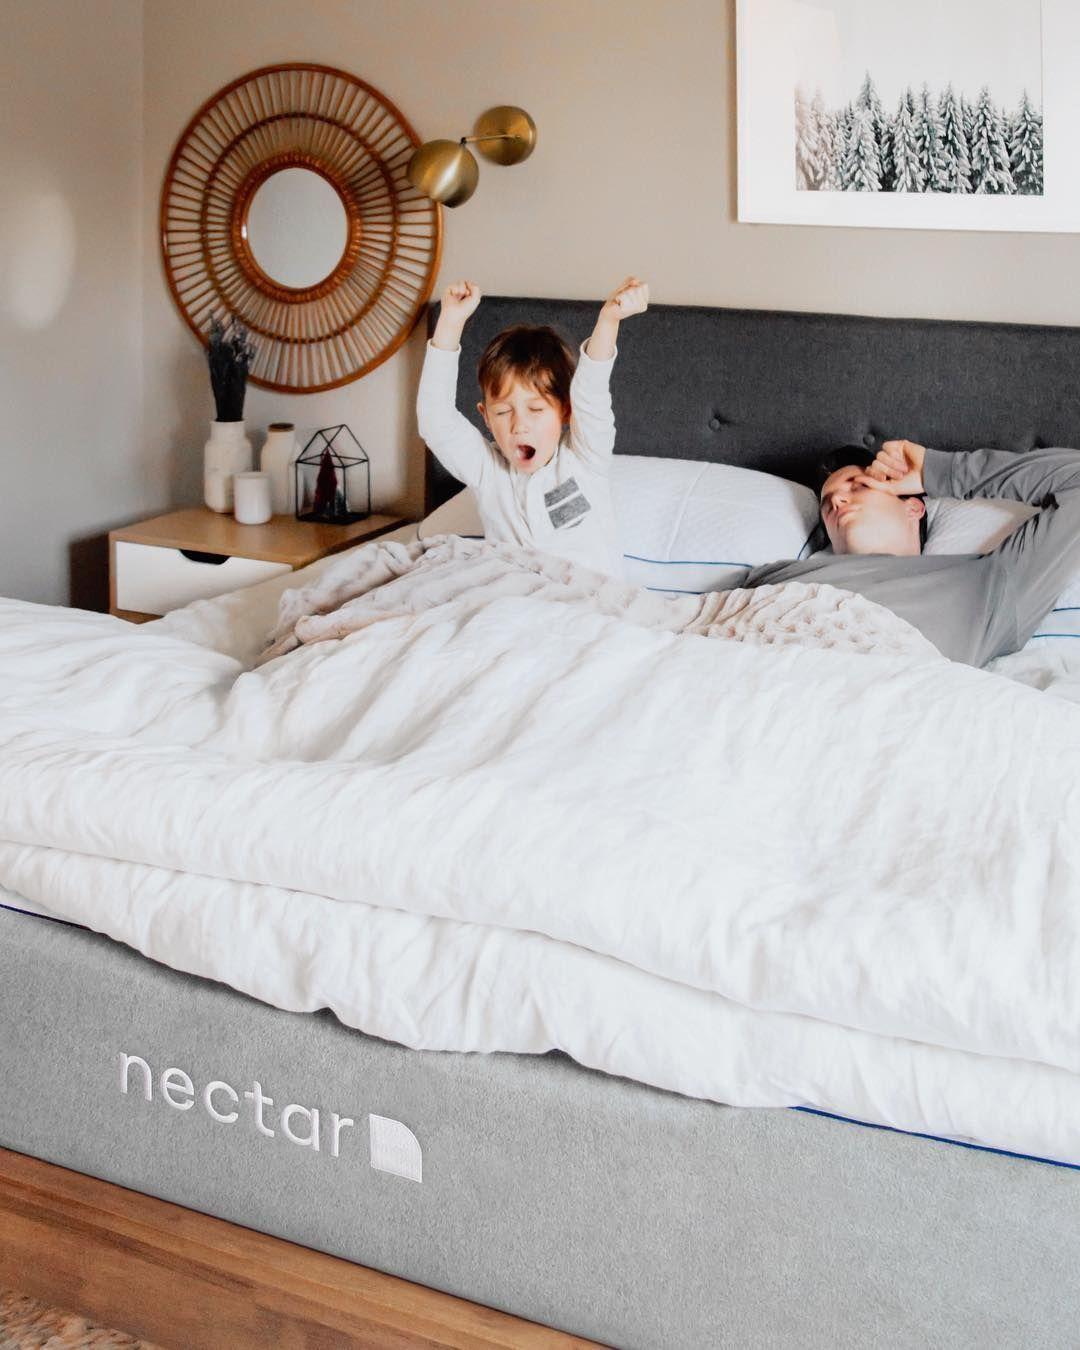 What Is The Best Mattress For Kids To Get A Good Night S Sleep King Size Mattress Best Mattress Sleep Accessories